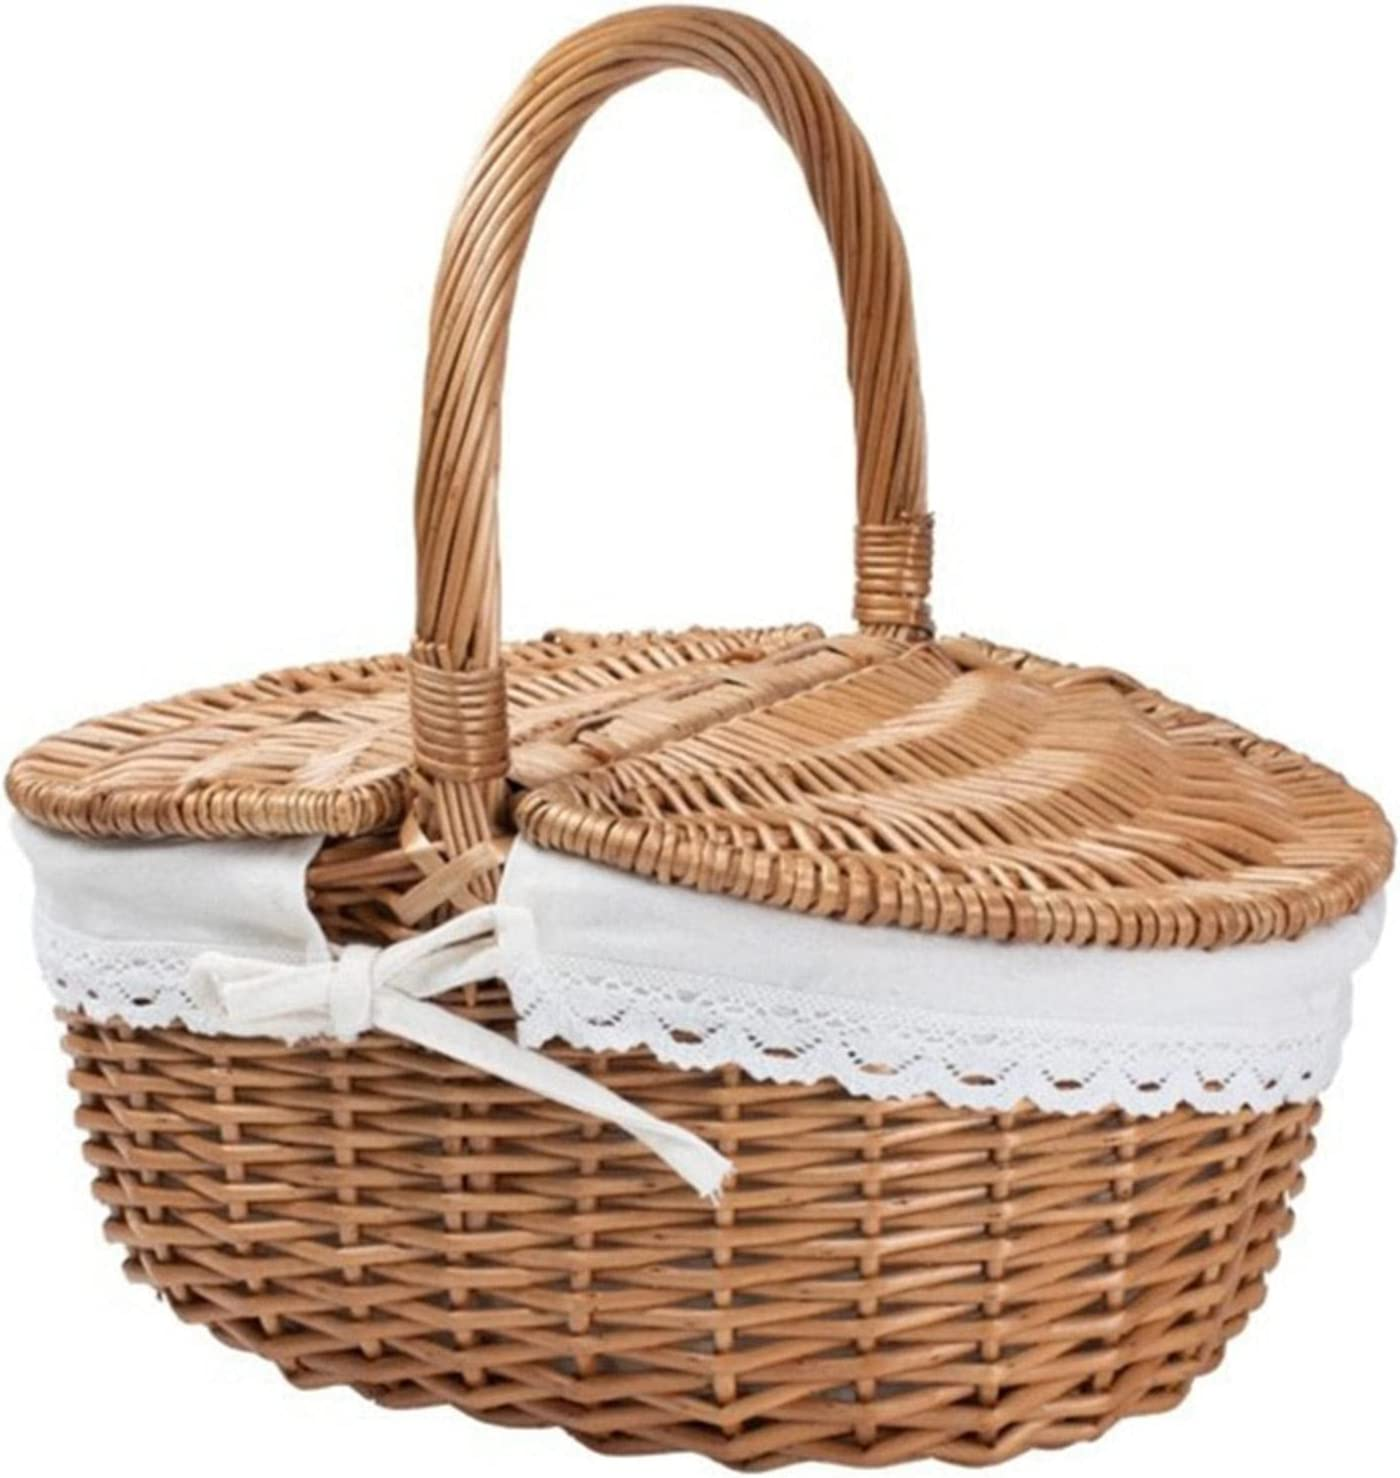 KLSAMNM Picnic Basket Max Choice 52% OFF Wood Design Handle Lid and Stu with